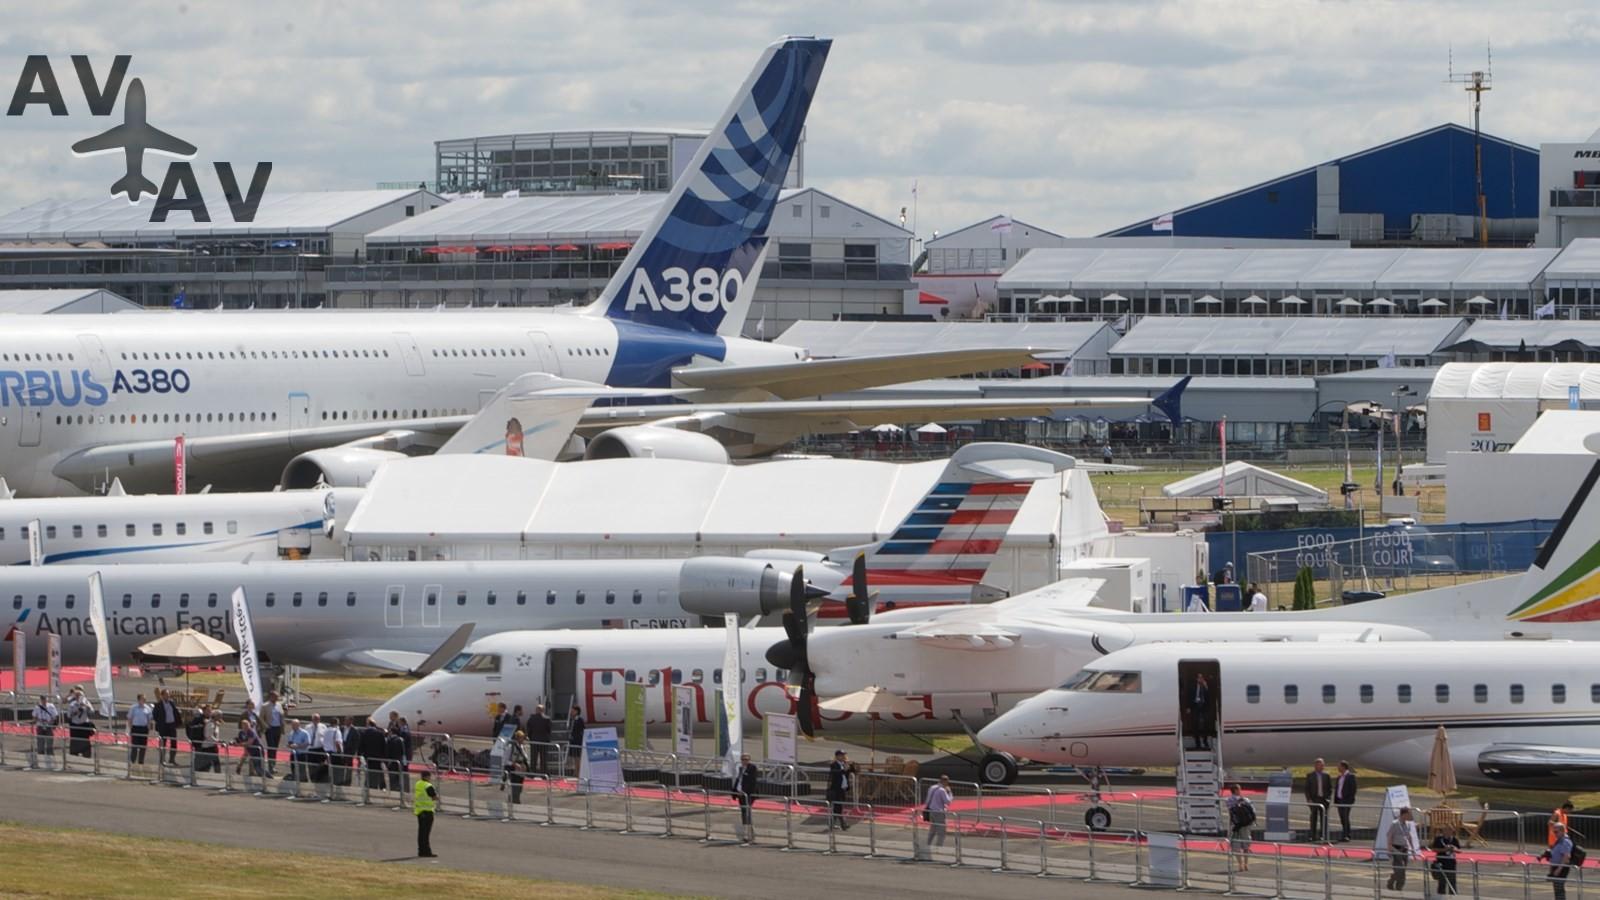 Farnborough farnairshow 2014 philw 159 - Авиасалон «Фарнборо» пройдет без России